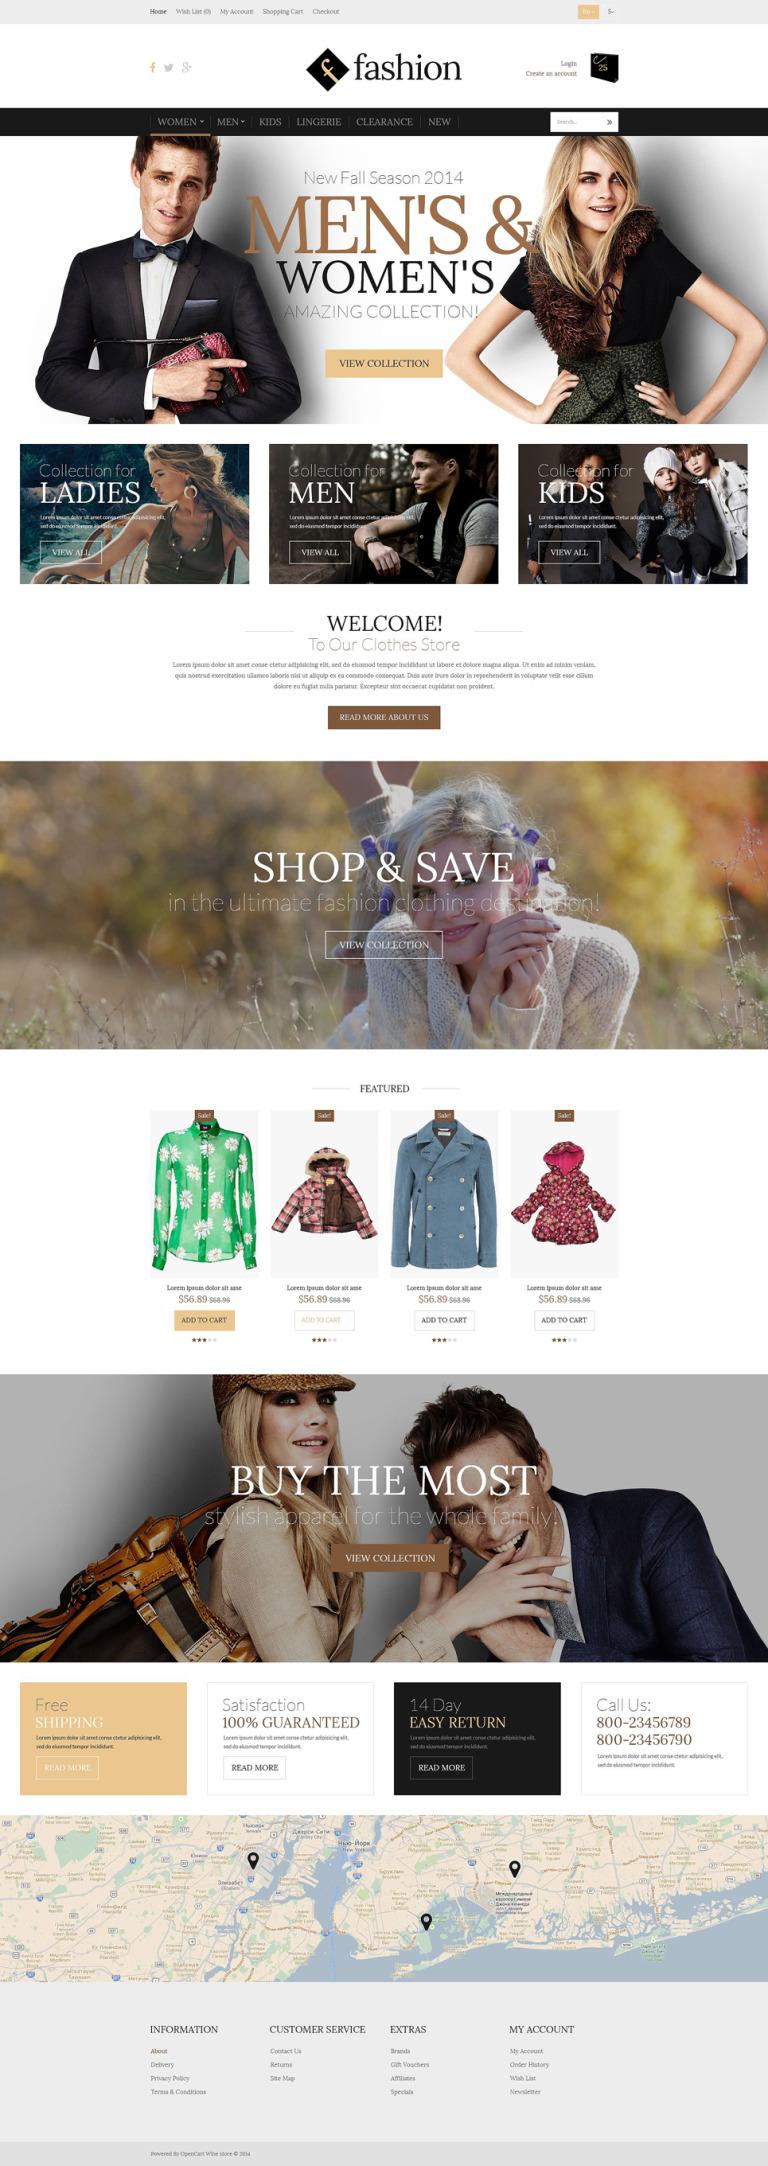 Fashion Board OpenCart Template New Screenshots BIG